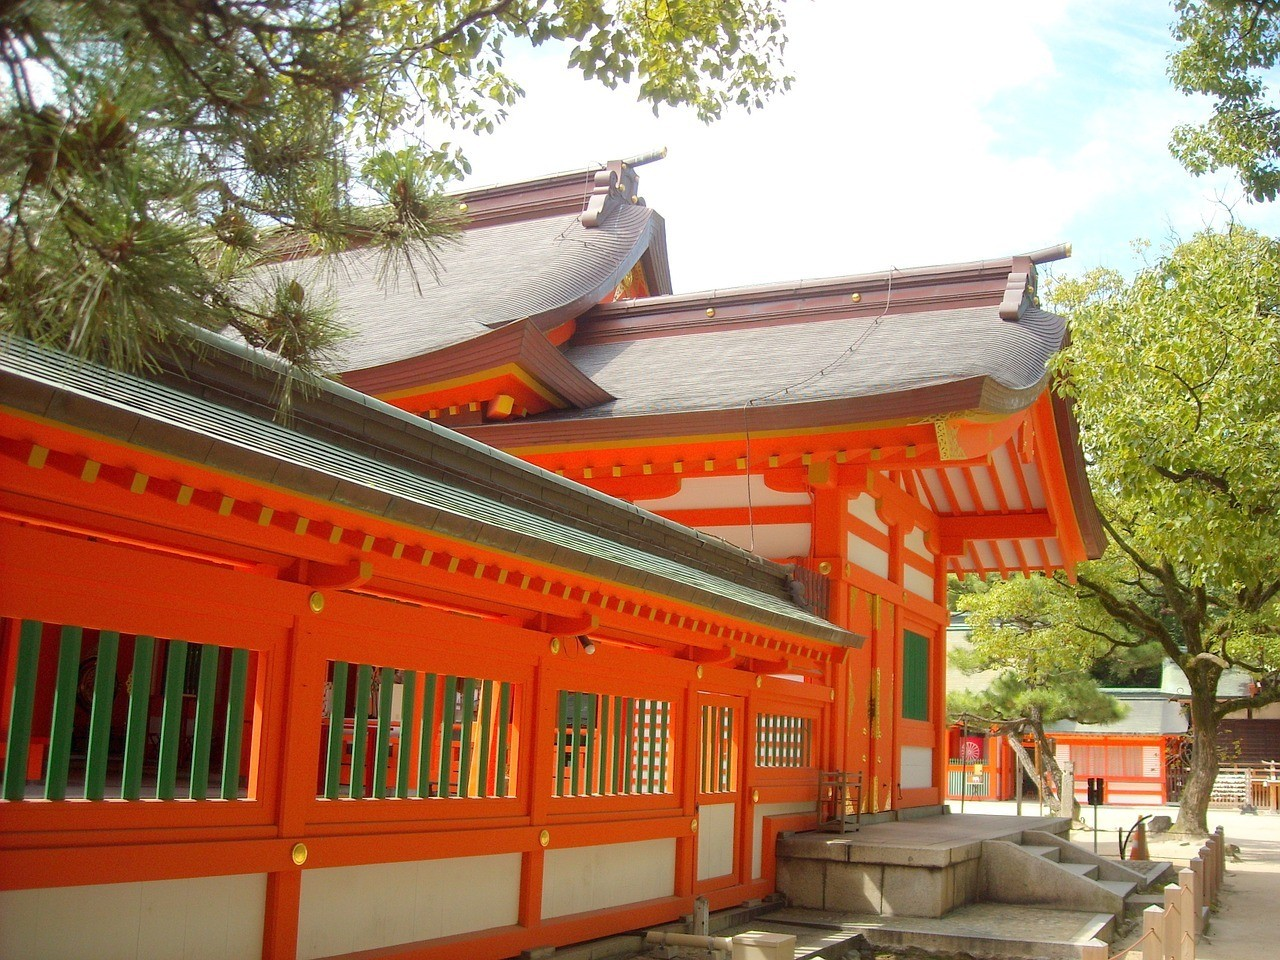 Chikuzen Sumiyoshi with Round Trip Cherry Tomato SIC Door to Door Transfer (Duration: approx. 03-04Hrs) **ALInoBABY**